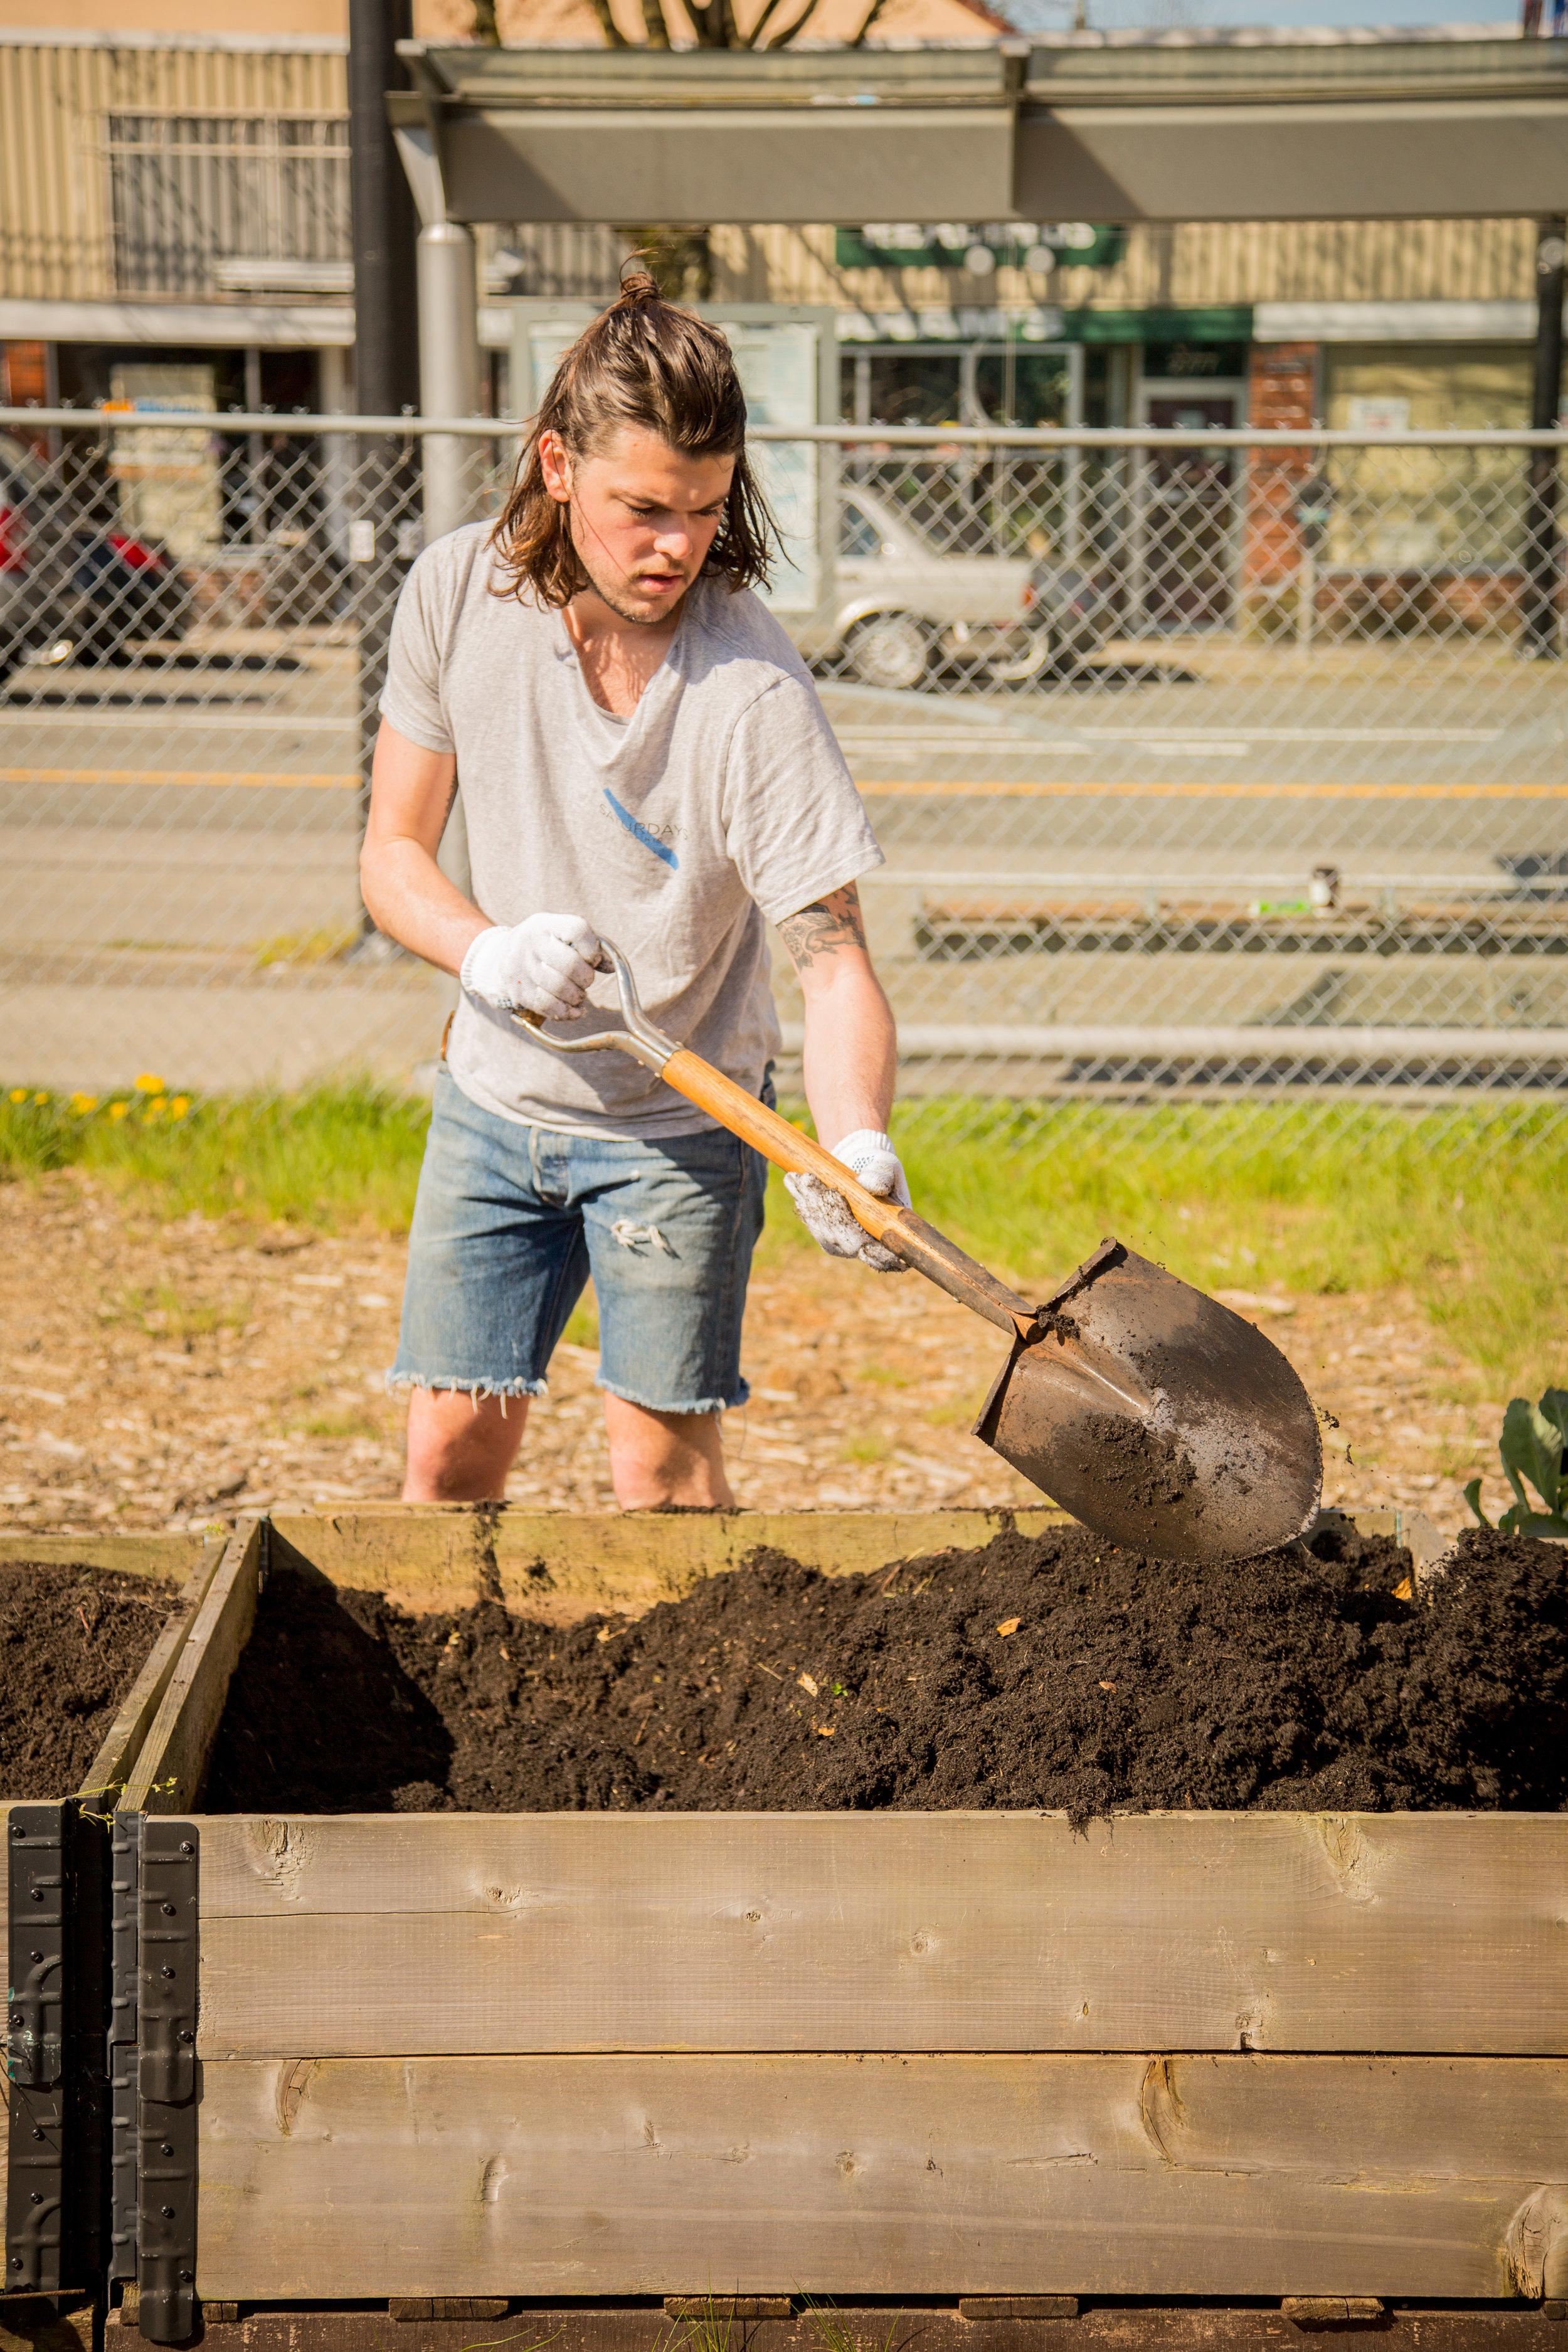 Raised_Garden_Bed_The_Drive_Temporary_Community_Garden_04.2016_Shifting_Growth_152.jpg